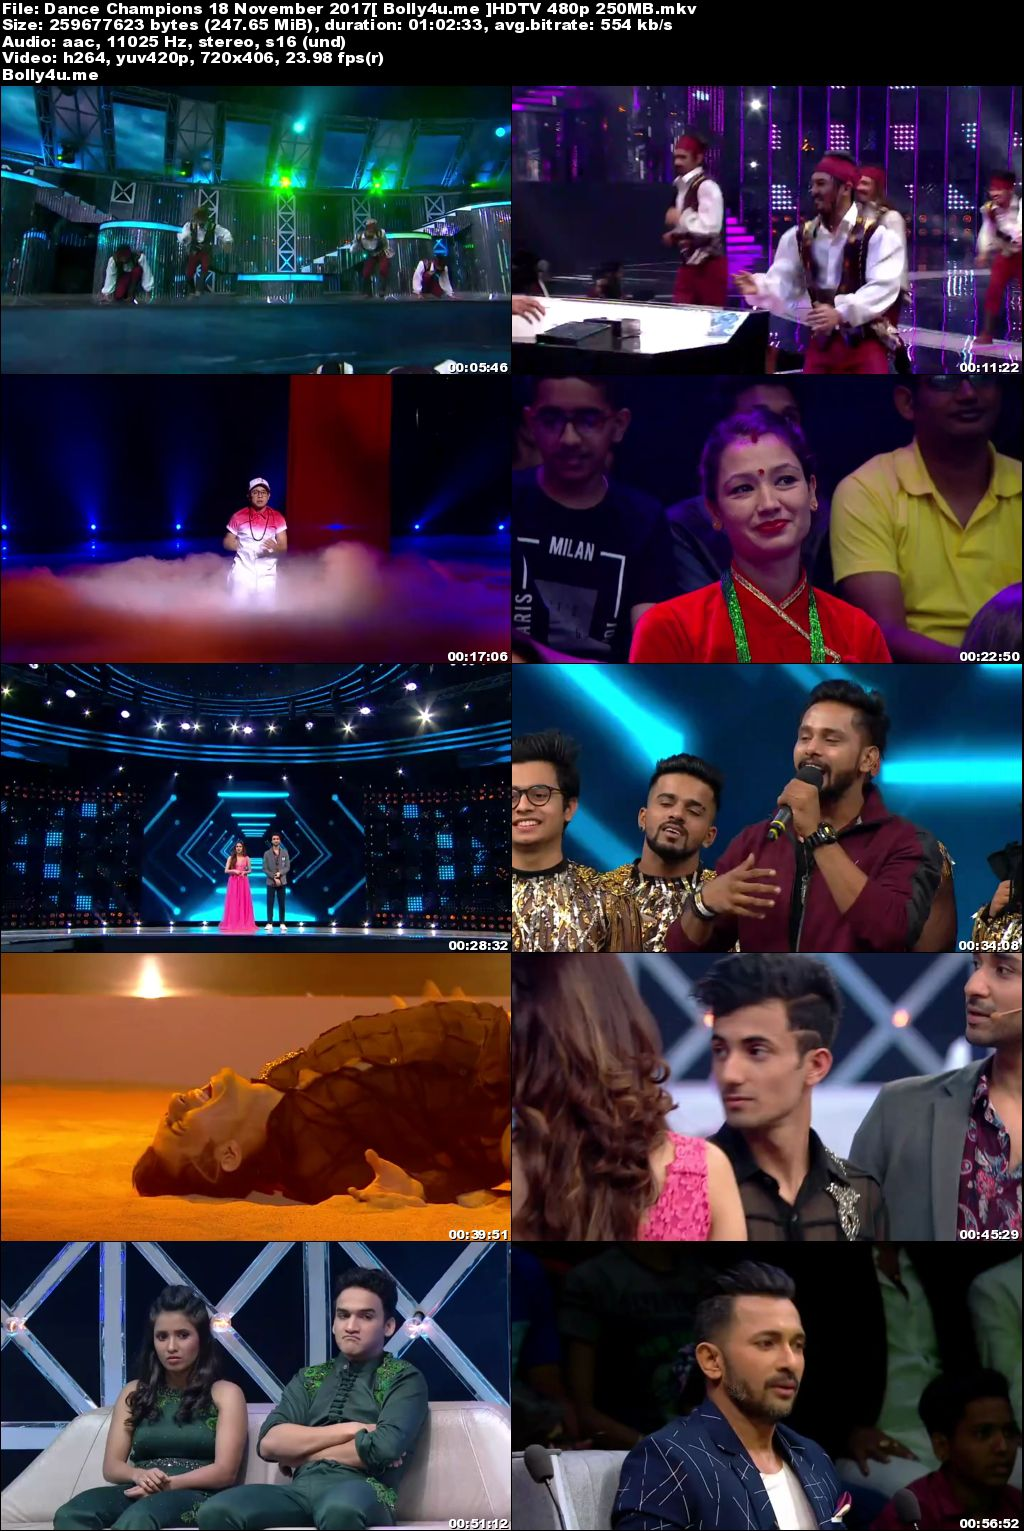 Dance Champions HDTV 480p 250MB 18 November 2017 Download